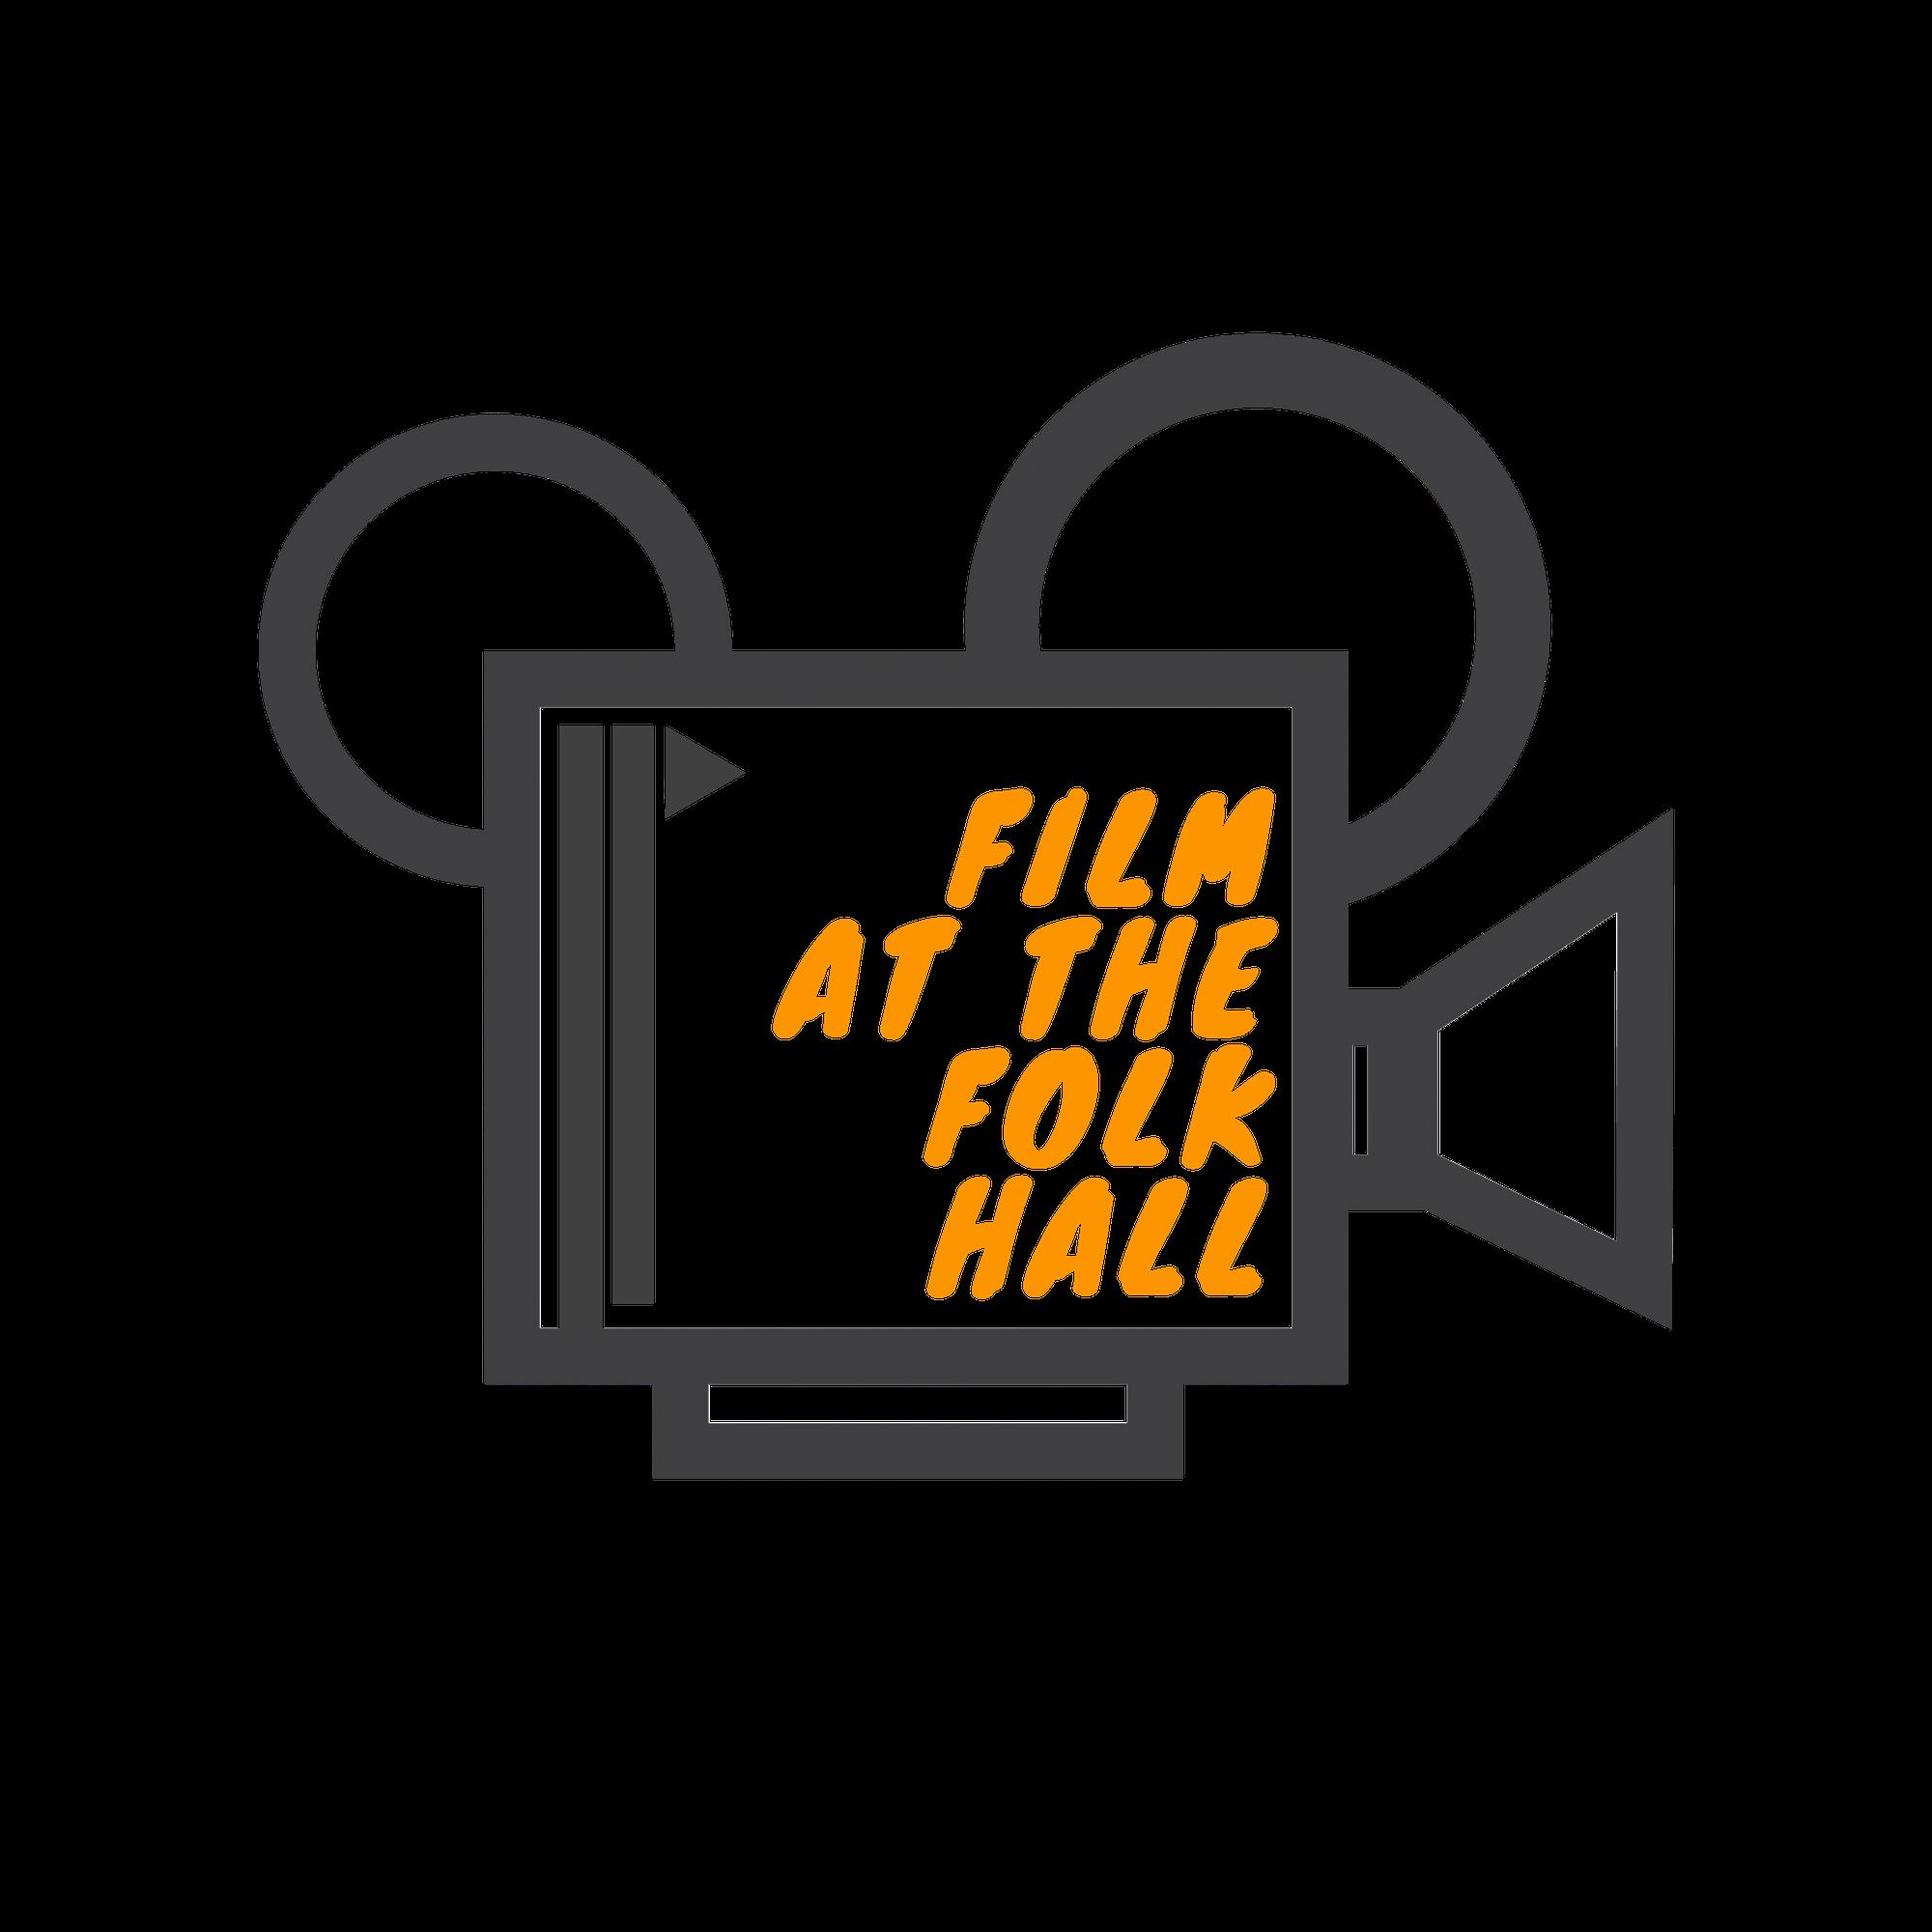 Film At The Folk Hall - York Cinema